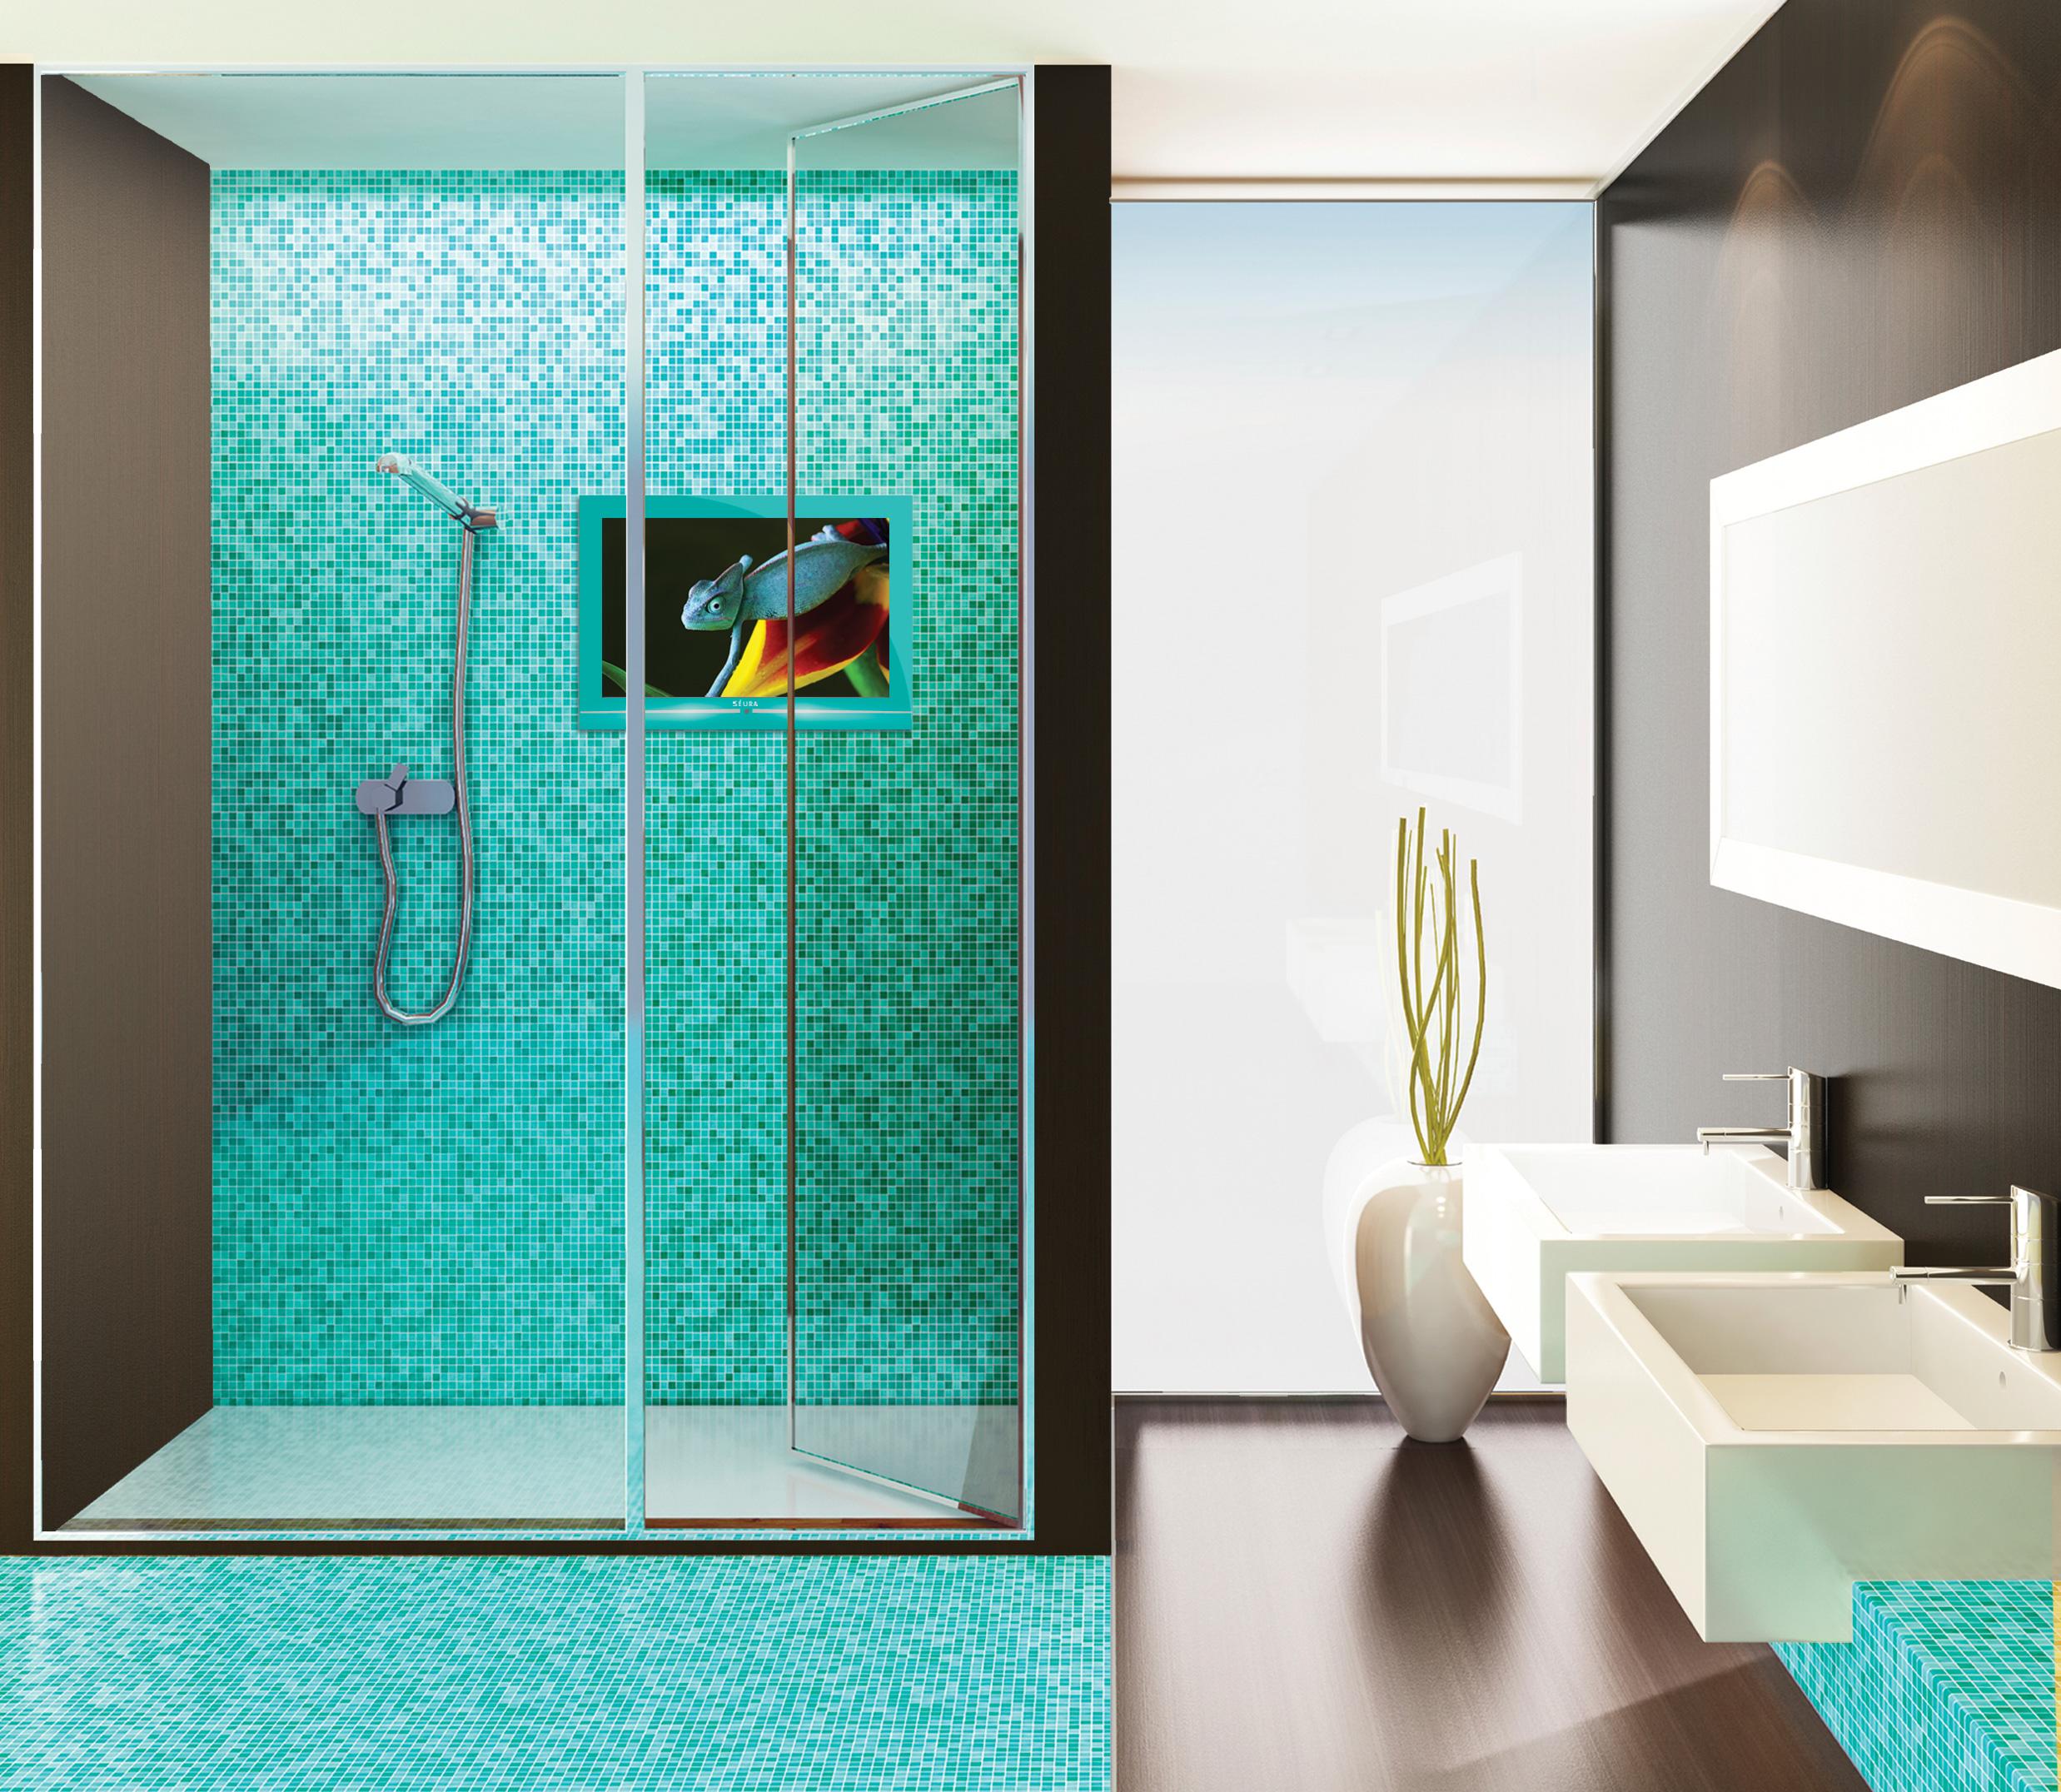 Seura Hydra TV - Waterproof Shower TV